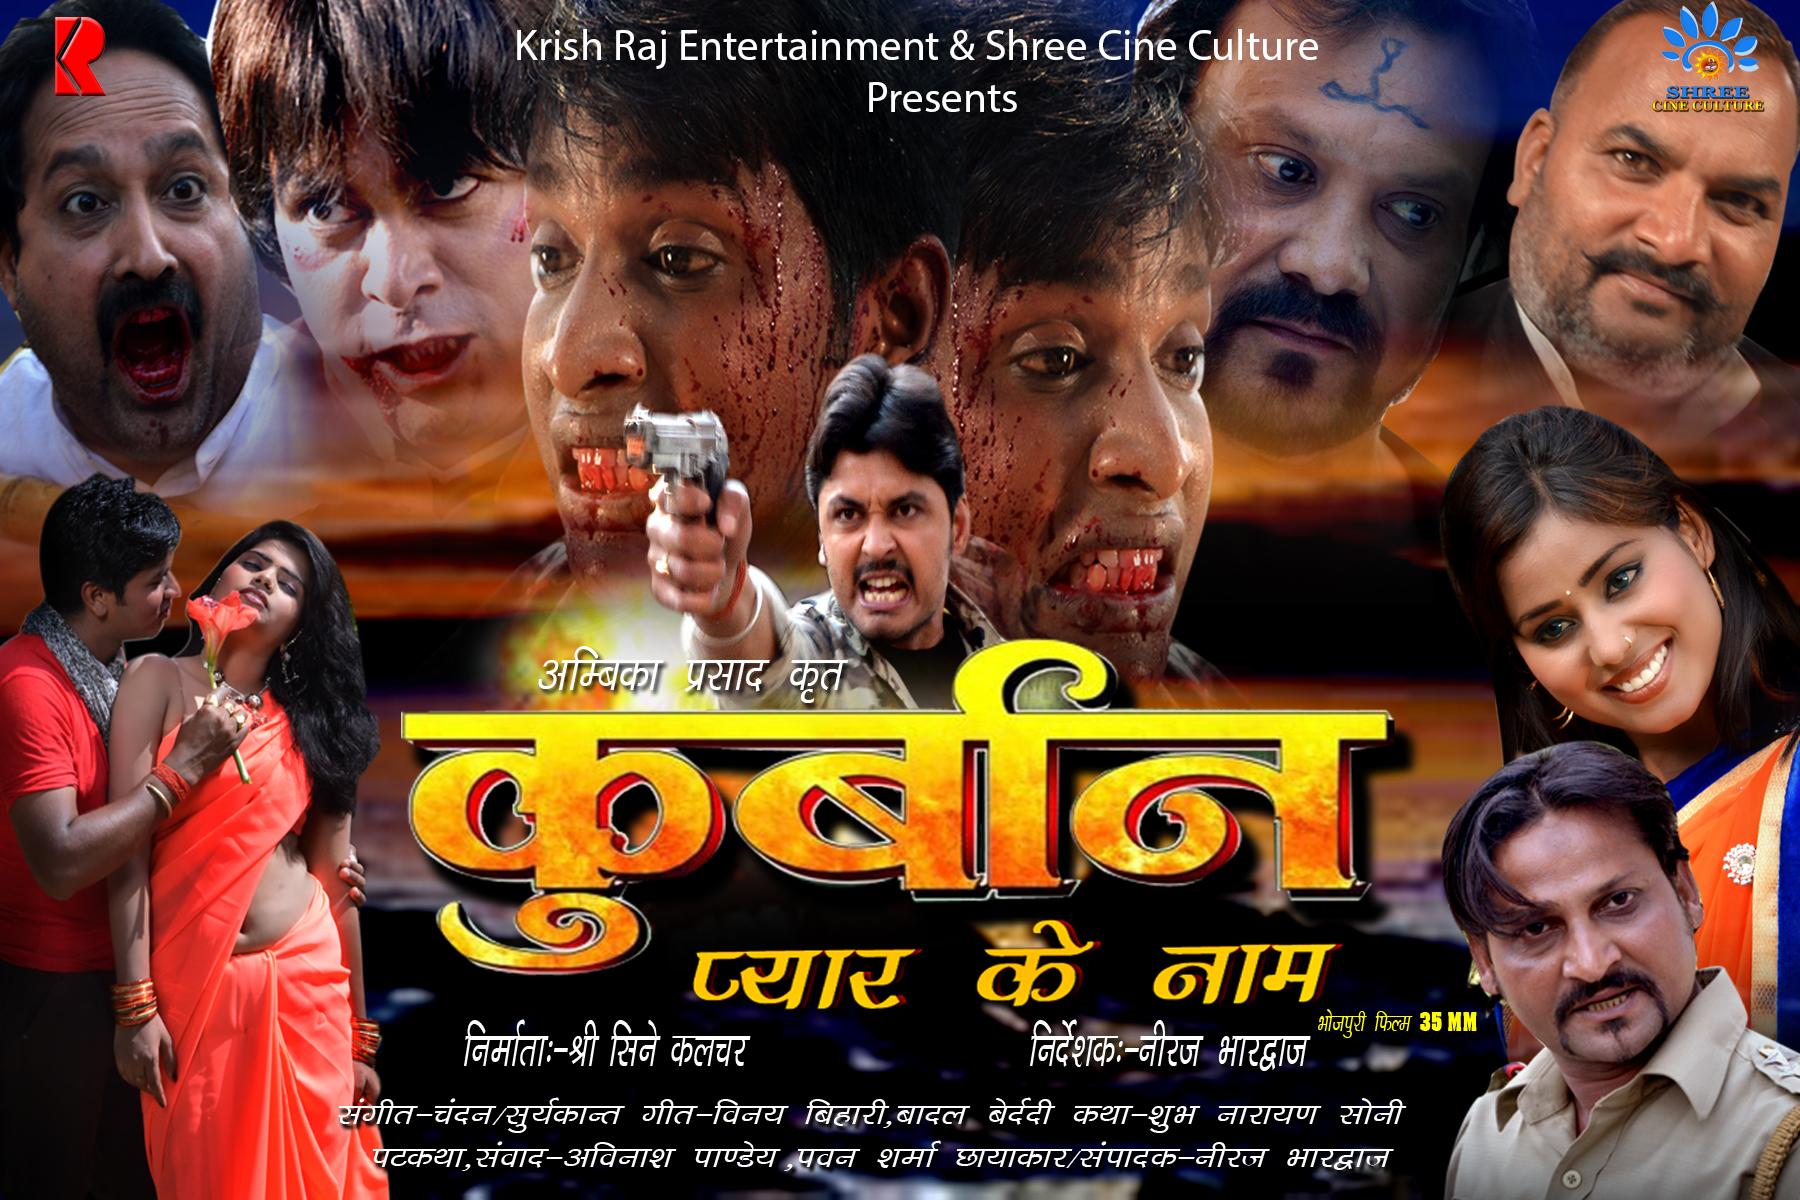 Kurban Pyar Ke Naam Bhojpuri Movie Wallpaper